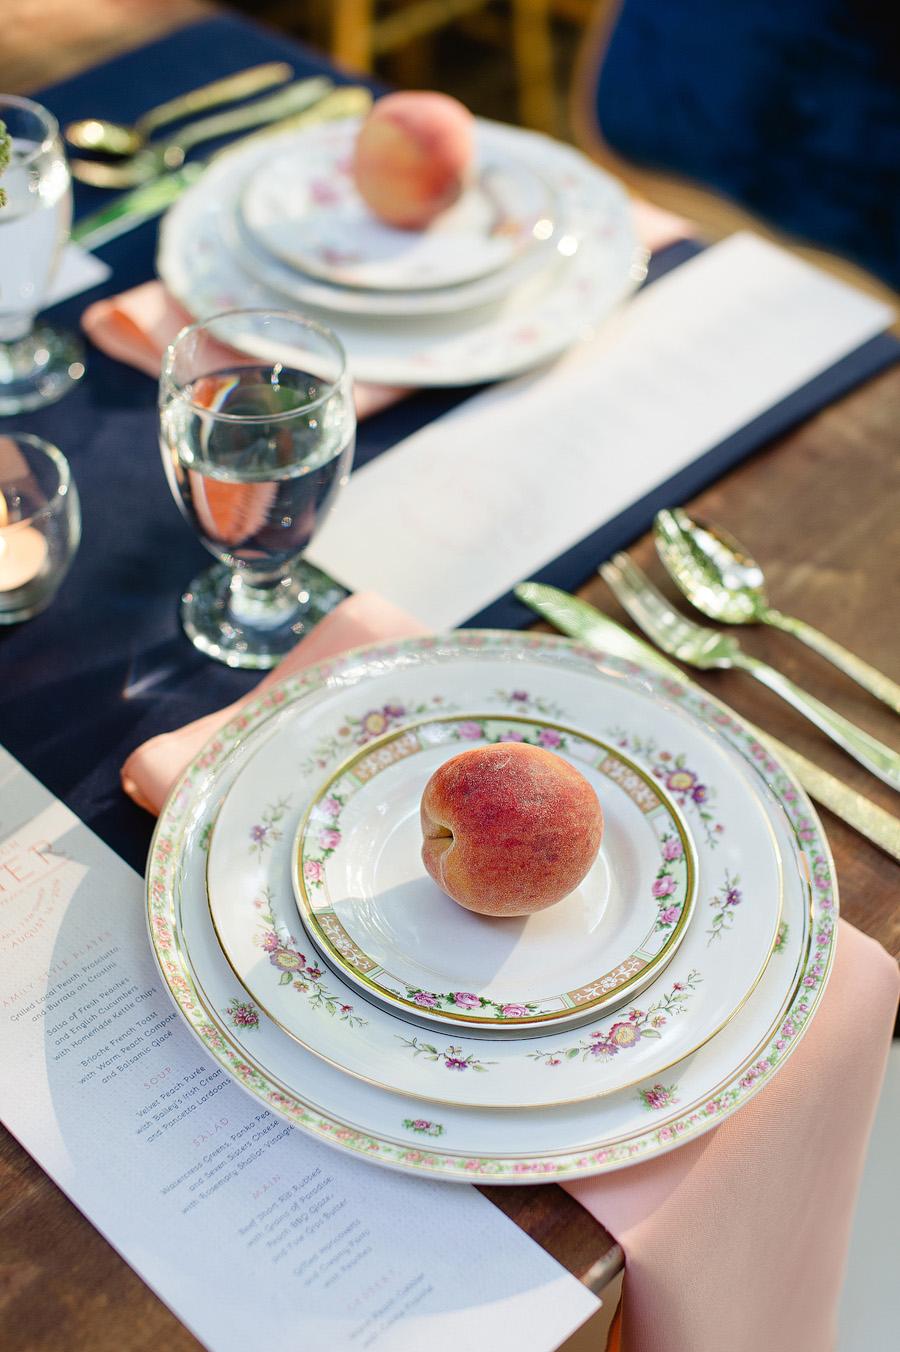 West-Chester-PA-Faunbrook-Harvest-Dinner-Series-Peach-AlexandraWhitney-159.jpg